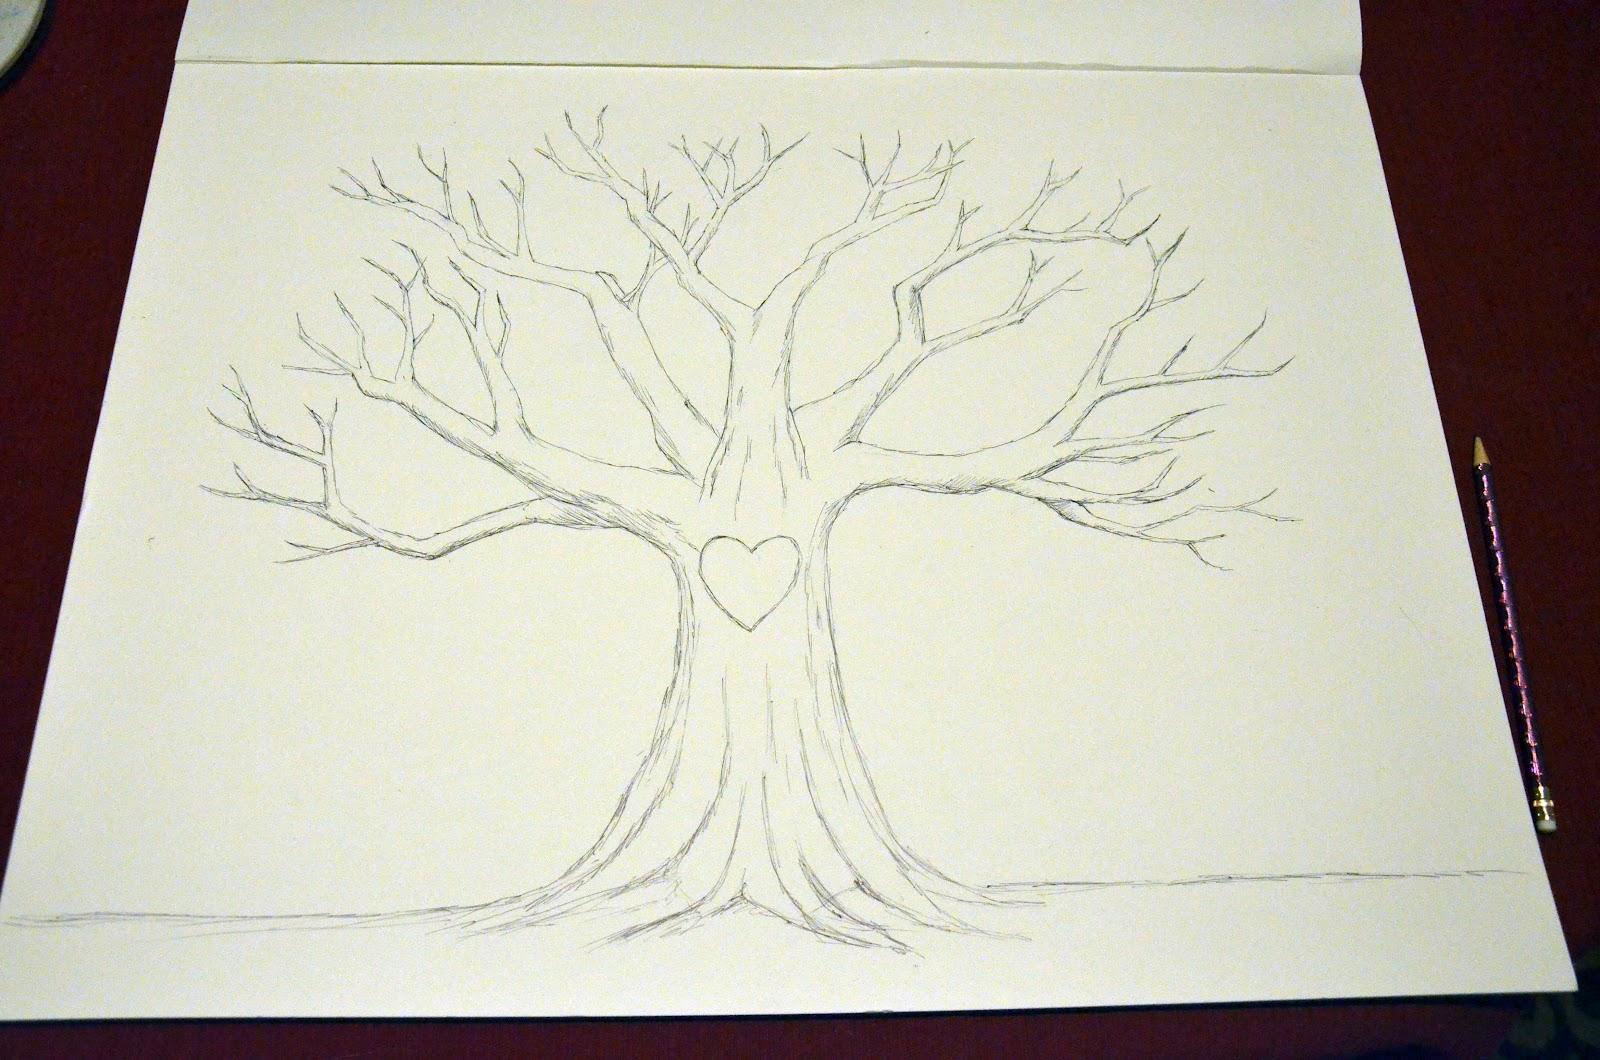 Как перенести фото на дерево Домашний мастер 35